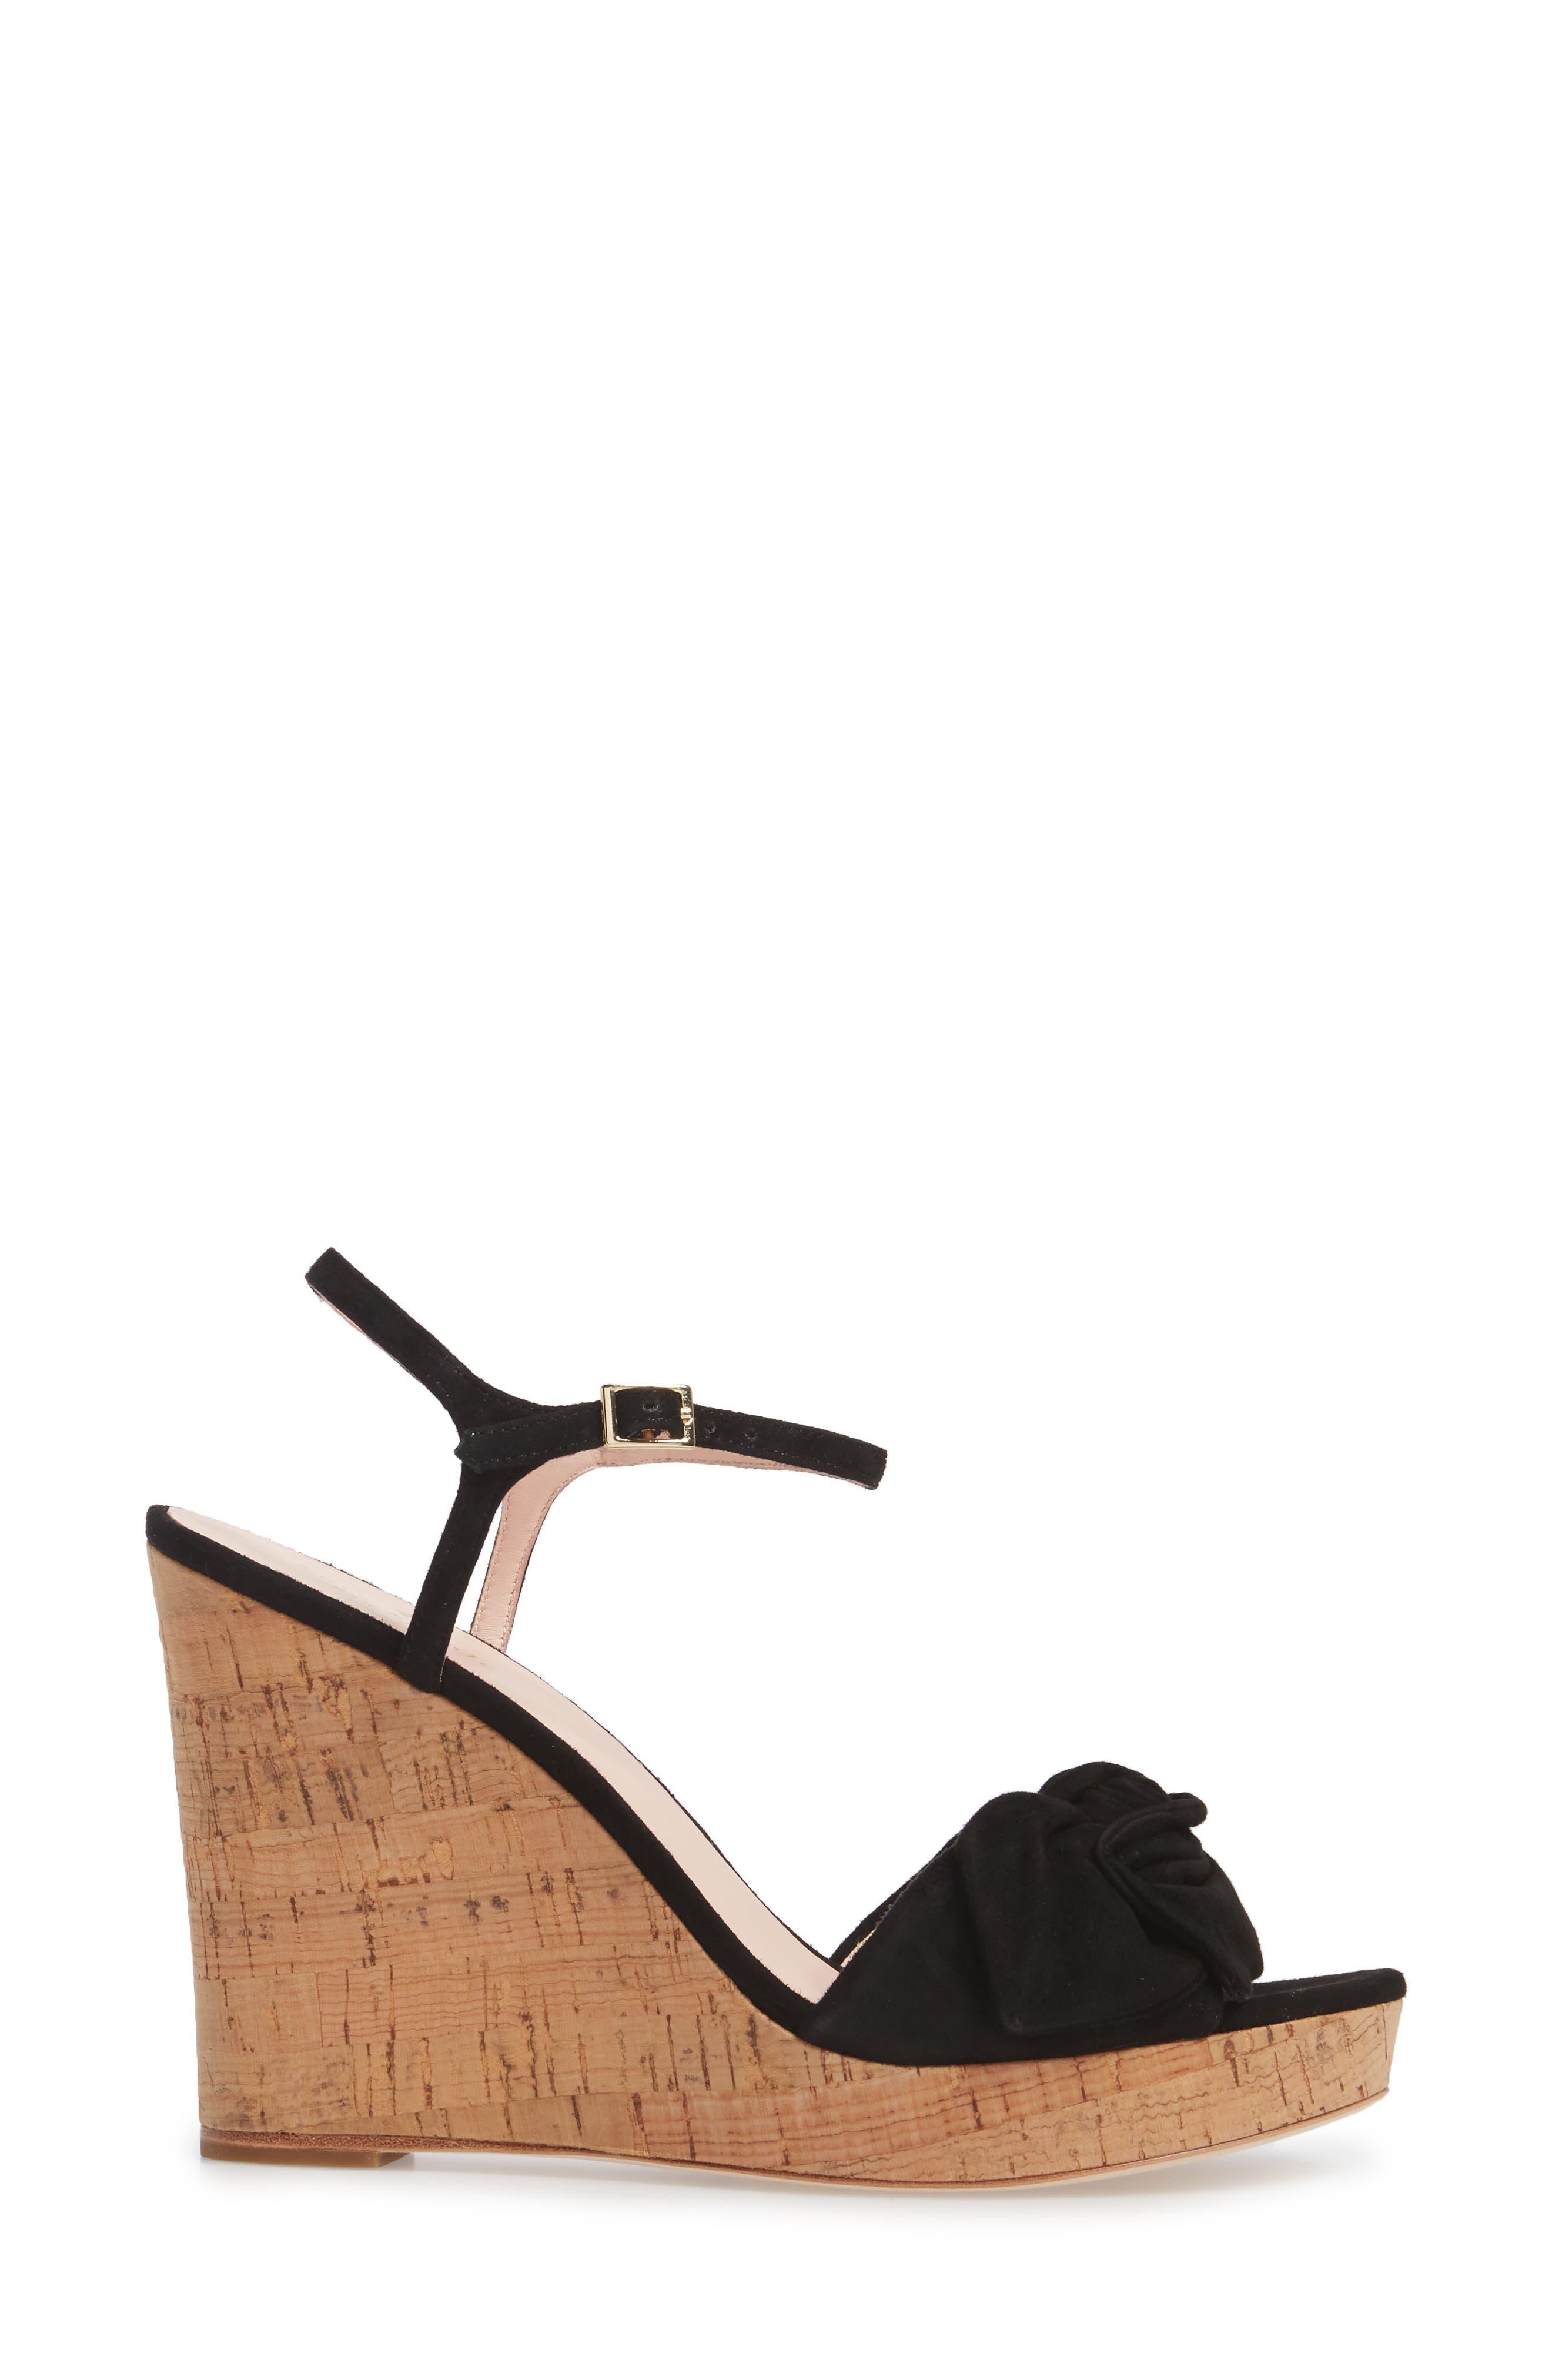 janae knot platform wedge sandal,                             Alternate thumbnail 3, color,                             001